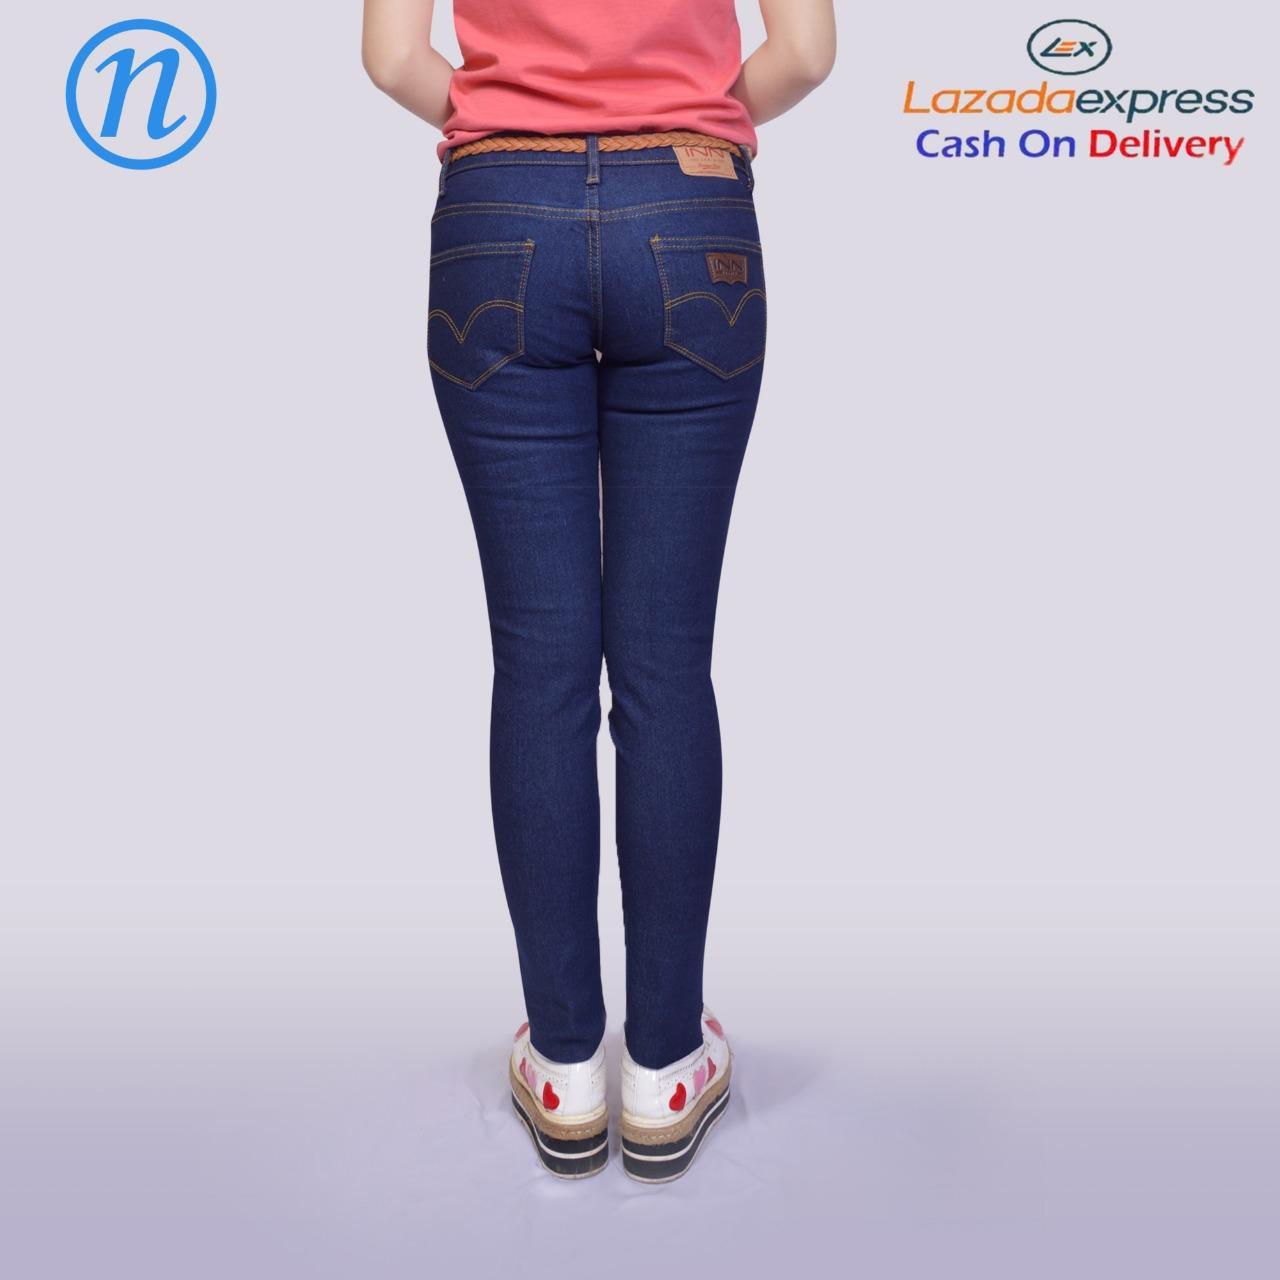 Celana Jeans Wanita Fashion Pakaian Blezer Jas Bawahan Wanita Skinny Street Soft Jeans - 3